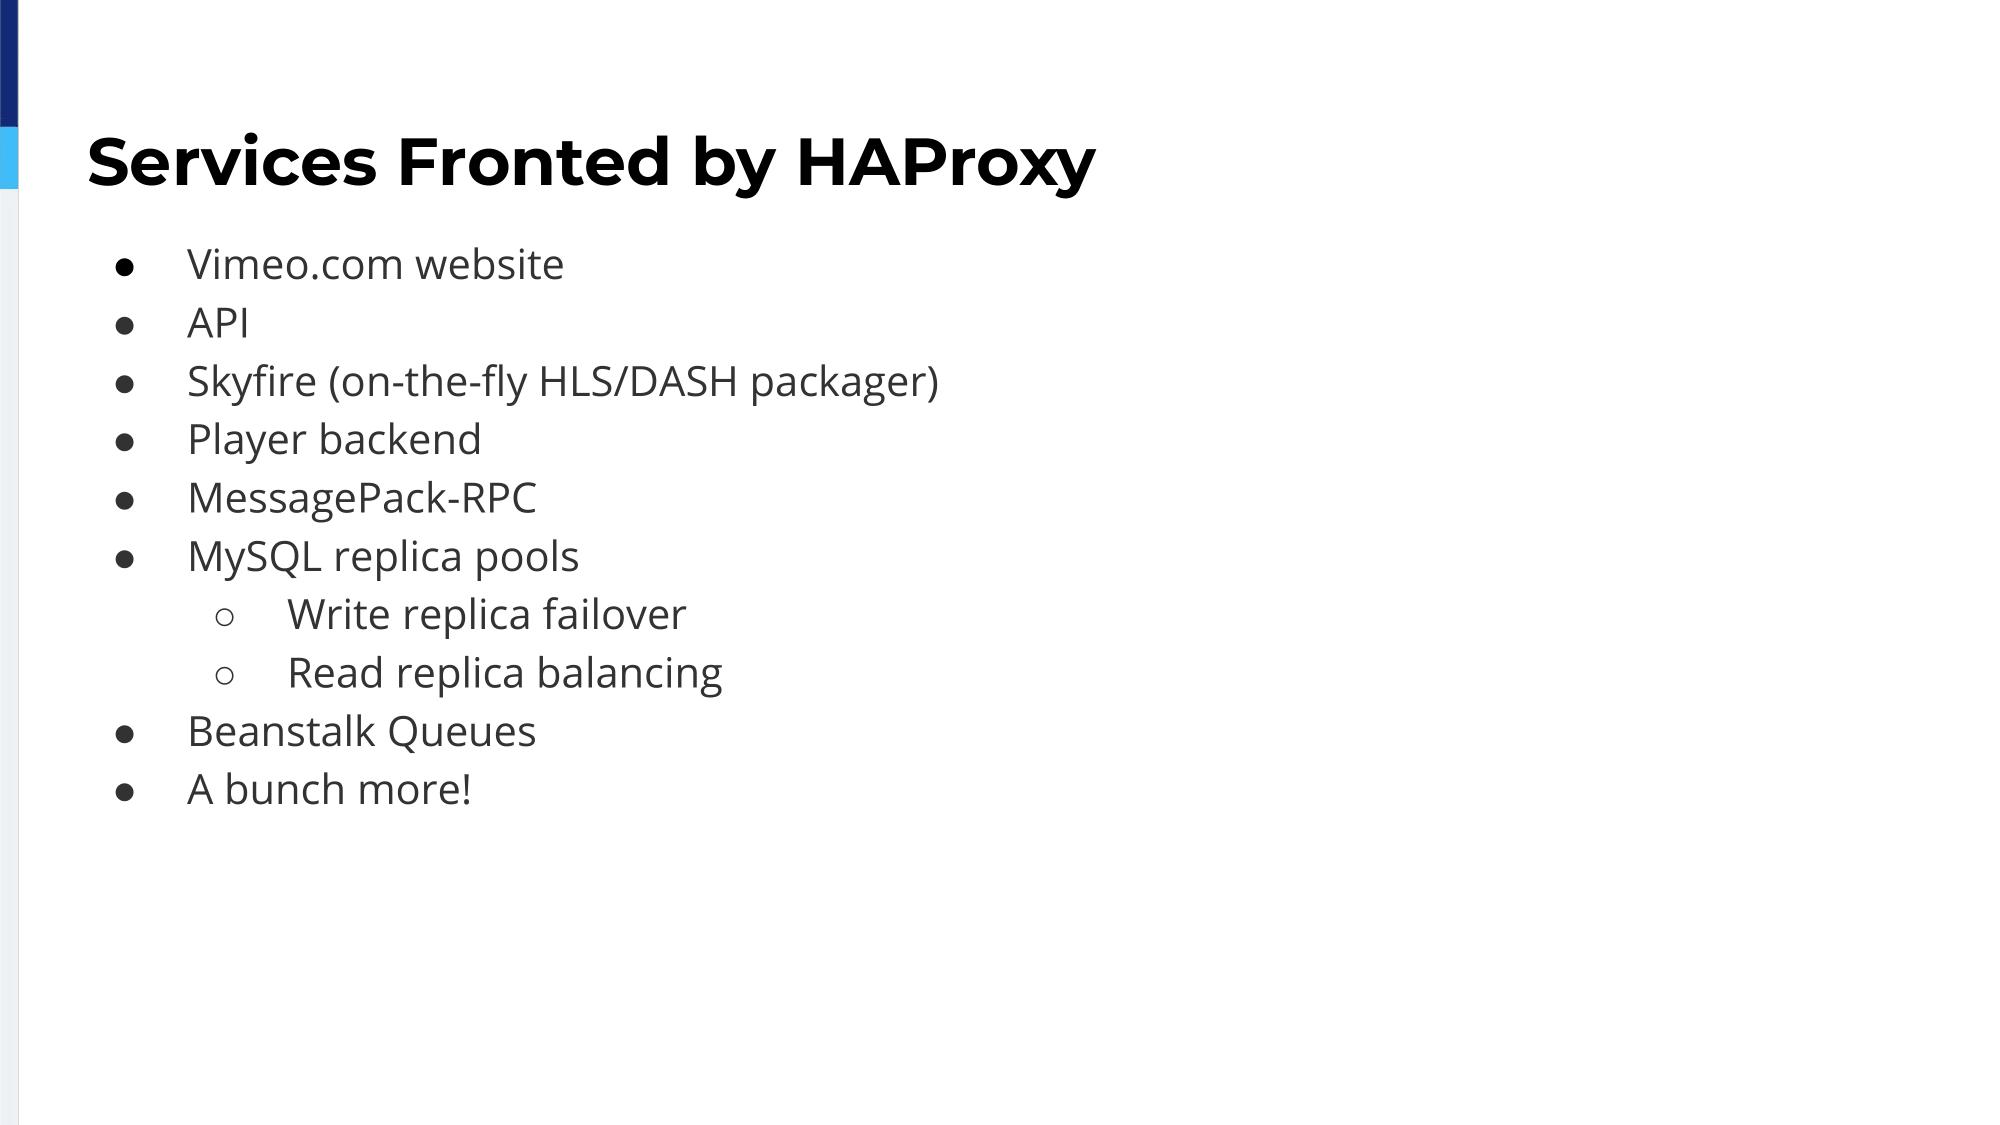 haproxyconf2019_haproxy load balancing at vimeo_andrew rodland_2